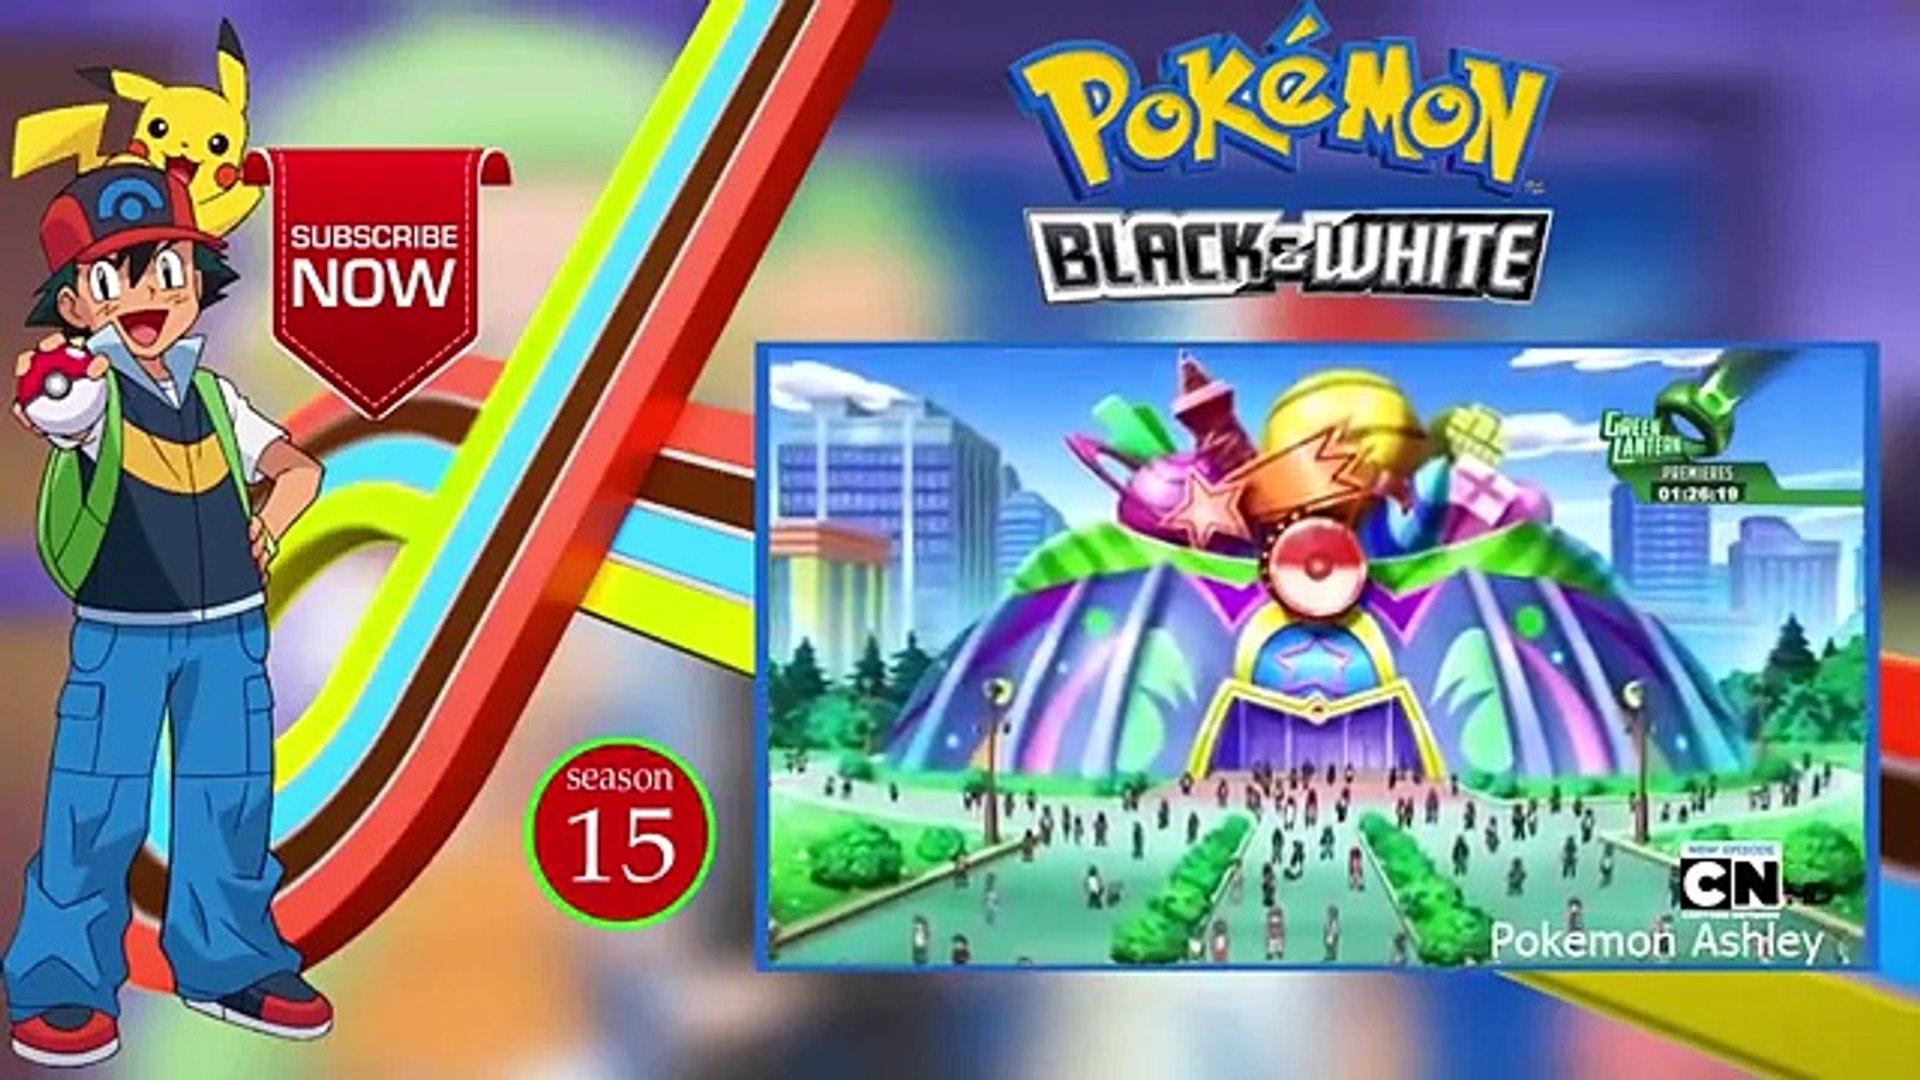 Pokemon in hindi black and white episode 7